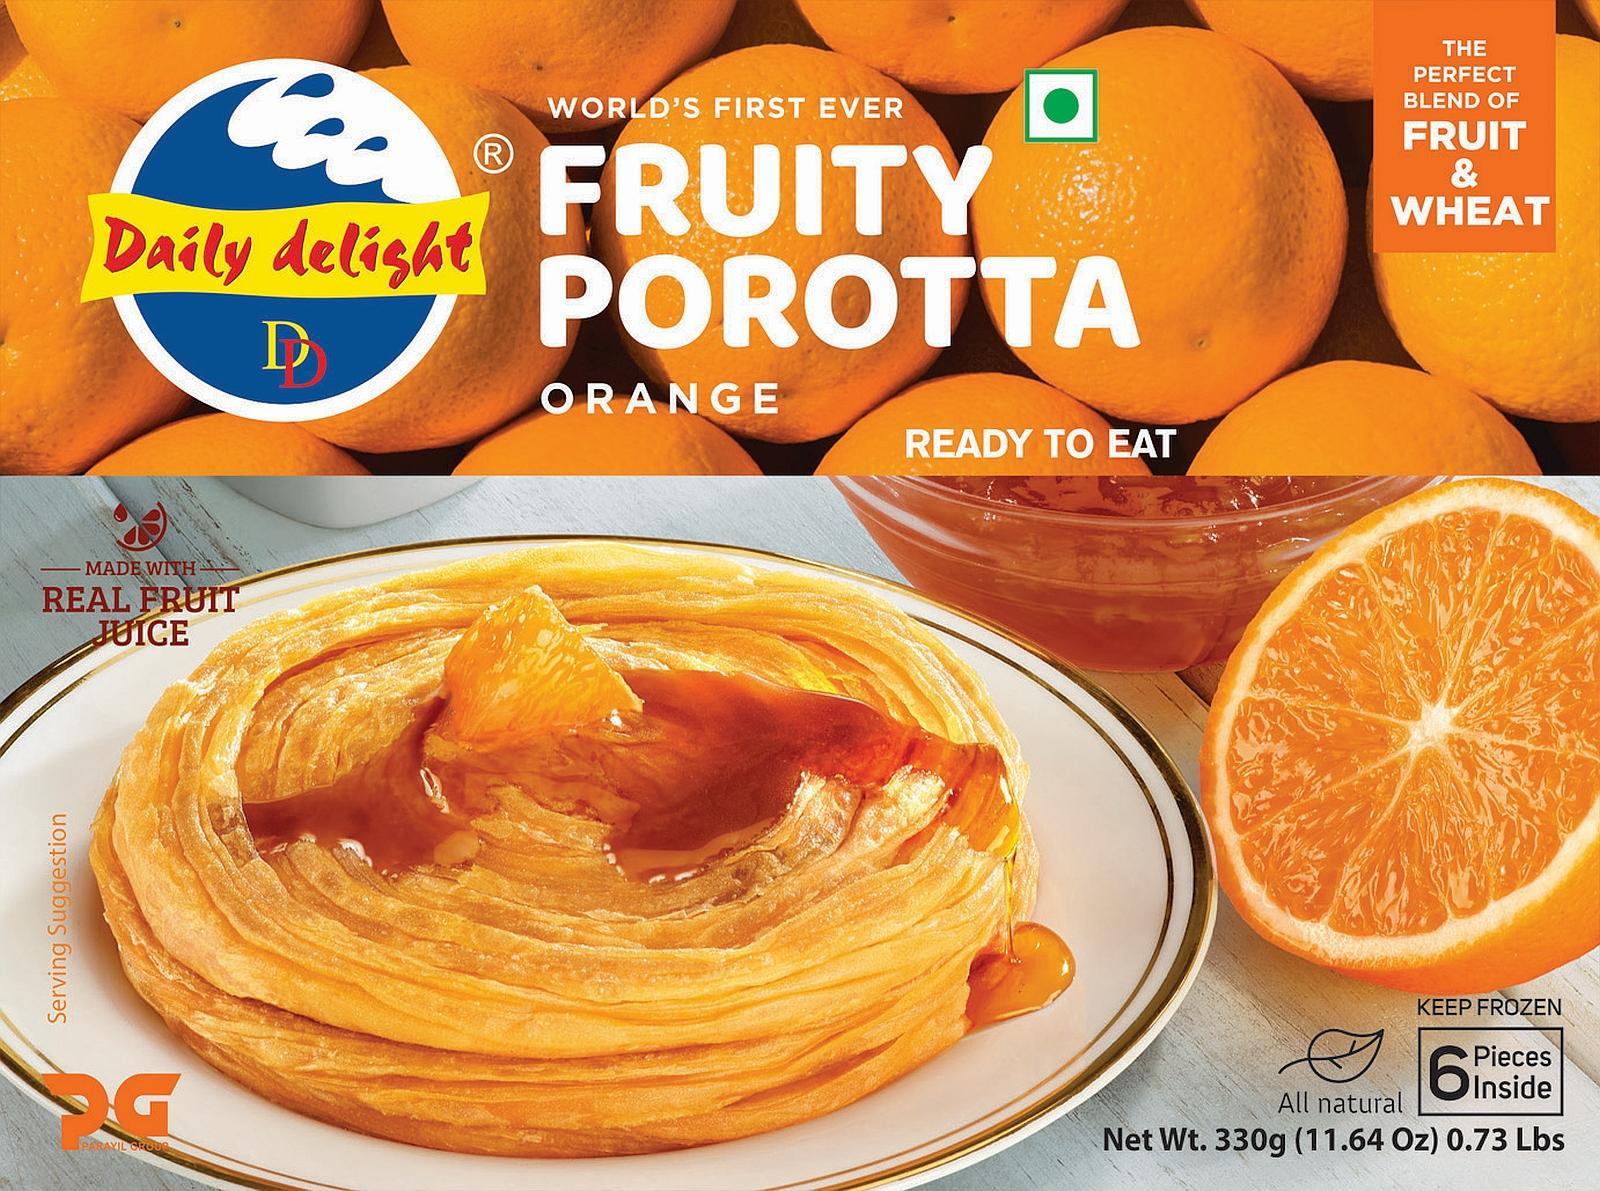 Daily Delight Orange Porotta